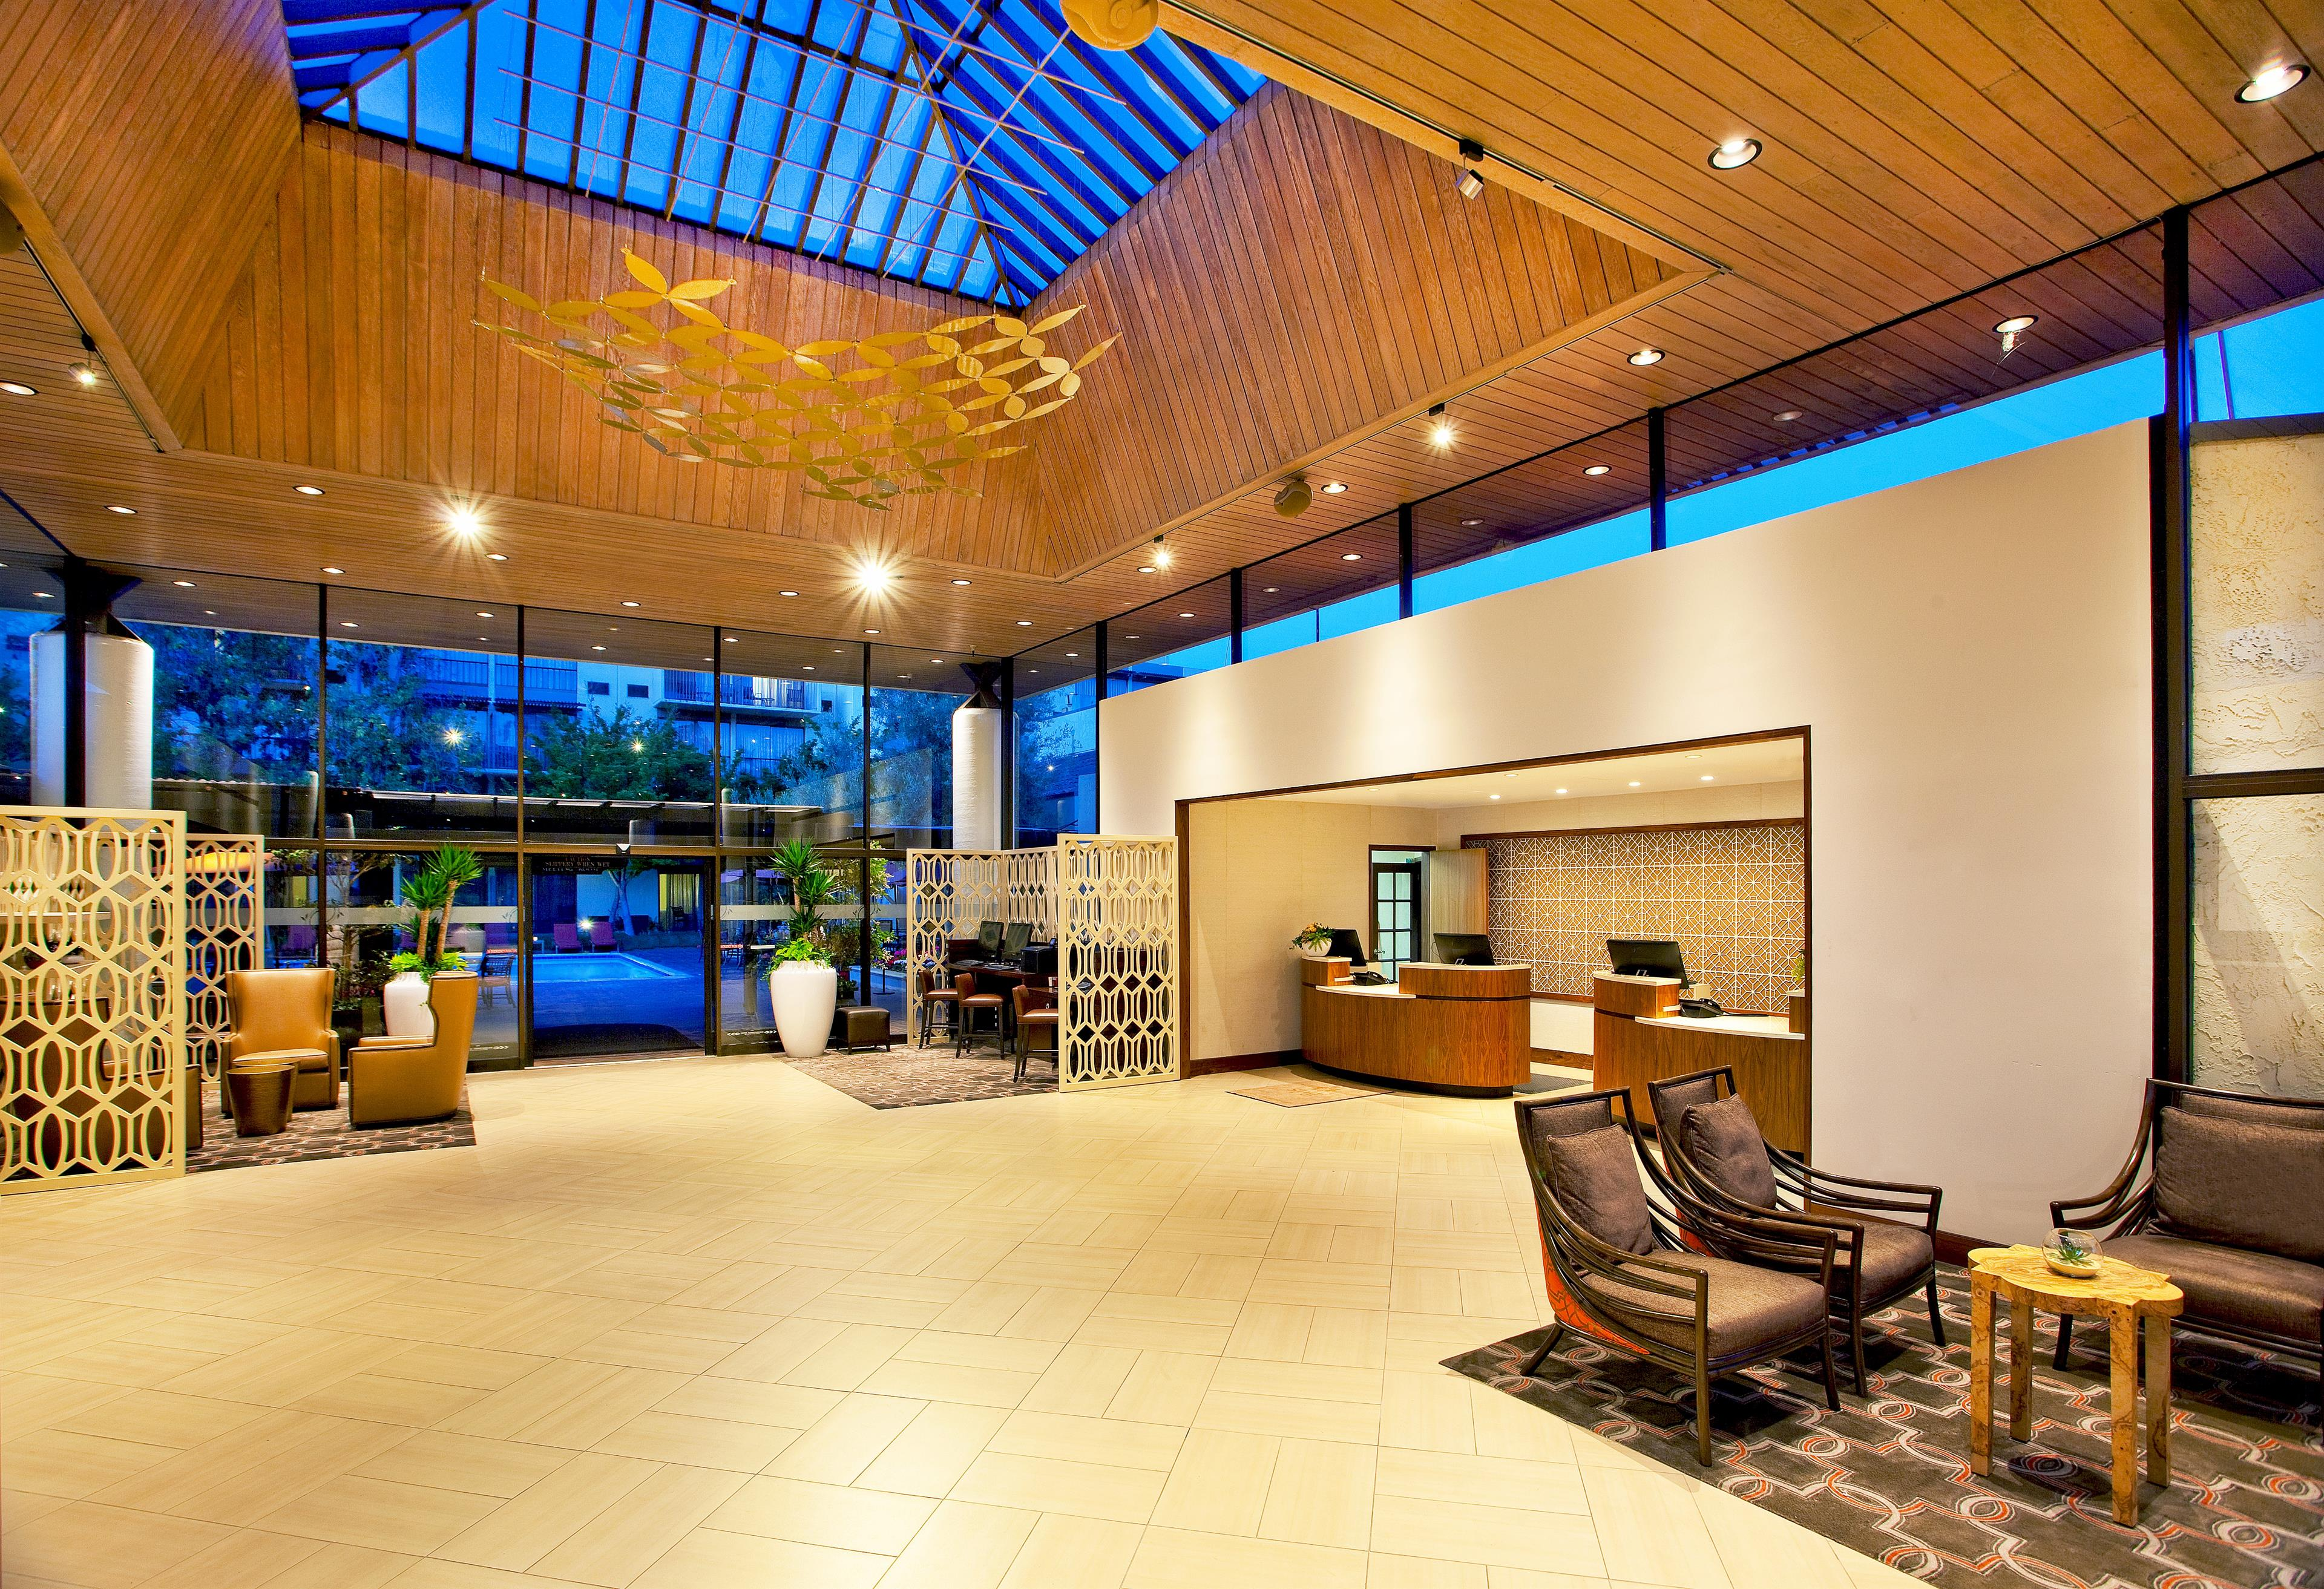 Sheraton Palo Alto Hotel image 7